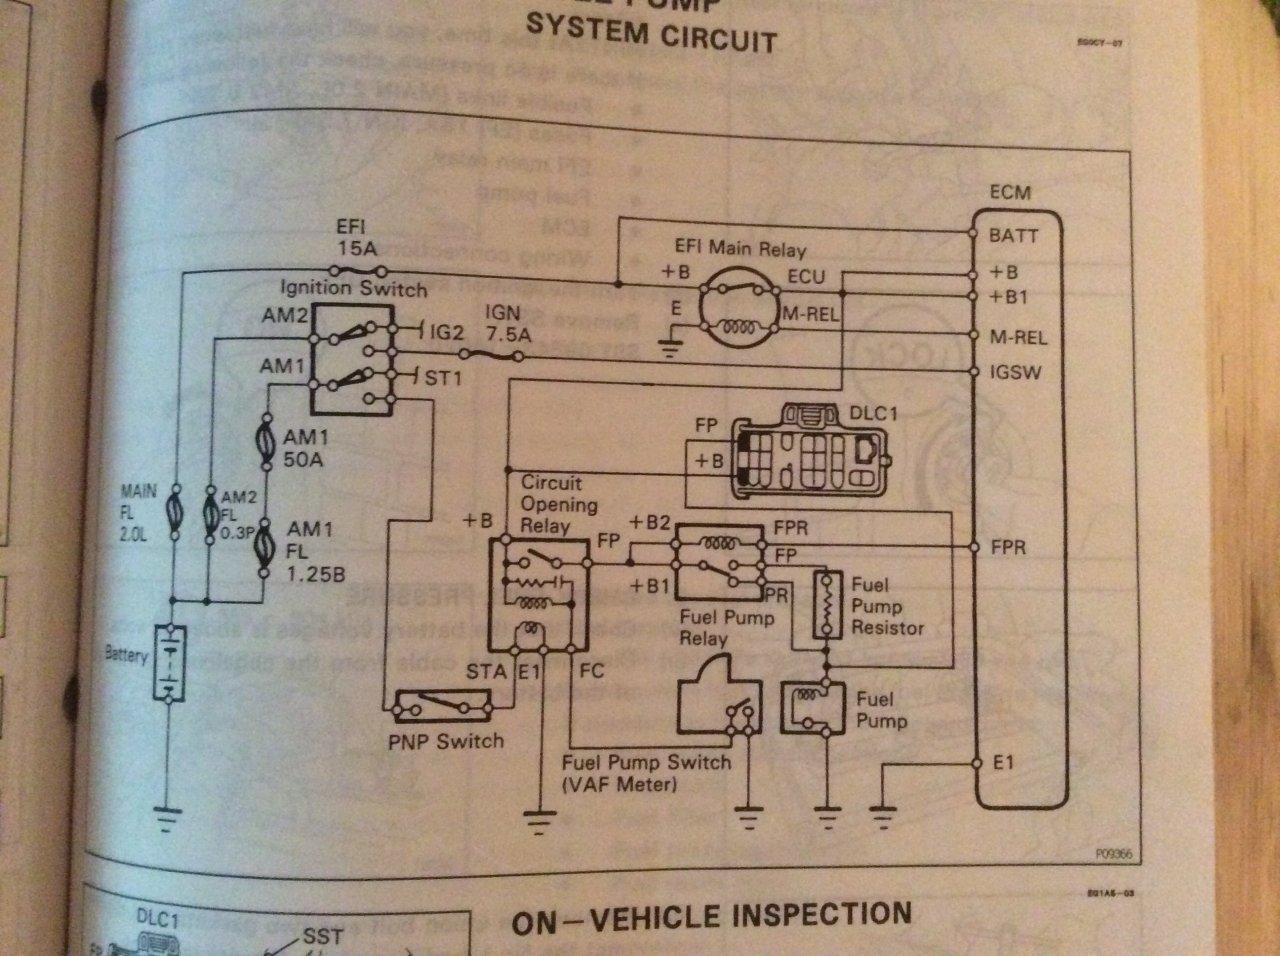 Relay Wiring Diagram On Wiring Diagram For Daihatsu Switch To Starter